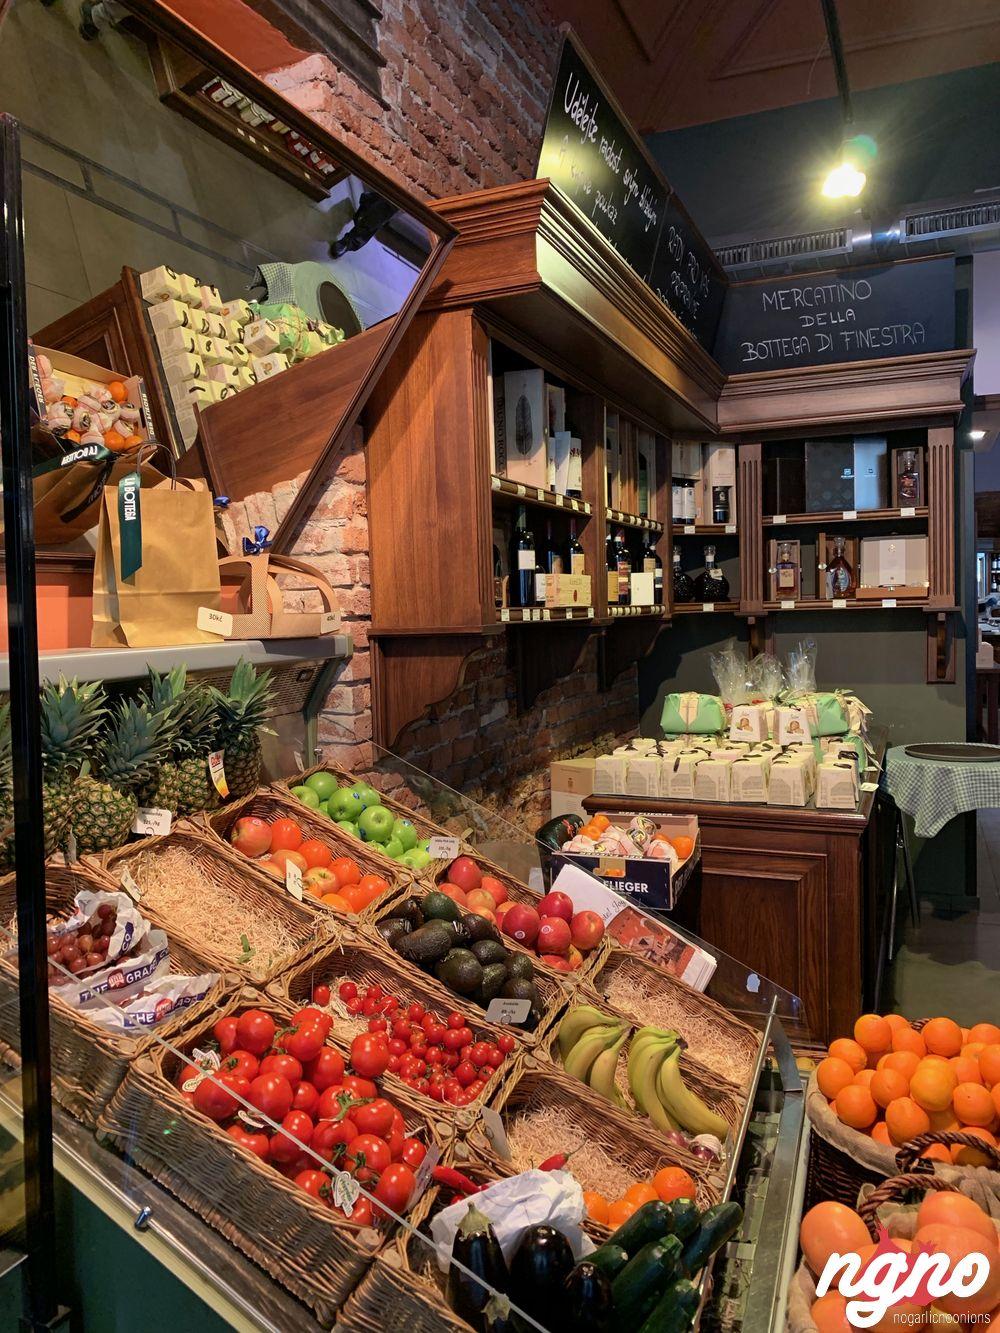 La bottega di finestra the italian marketplace of prague nogarlicnoonions restaurant food - La finestra prague ...